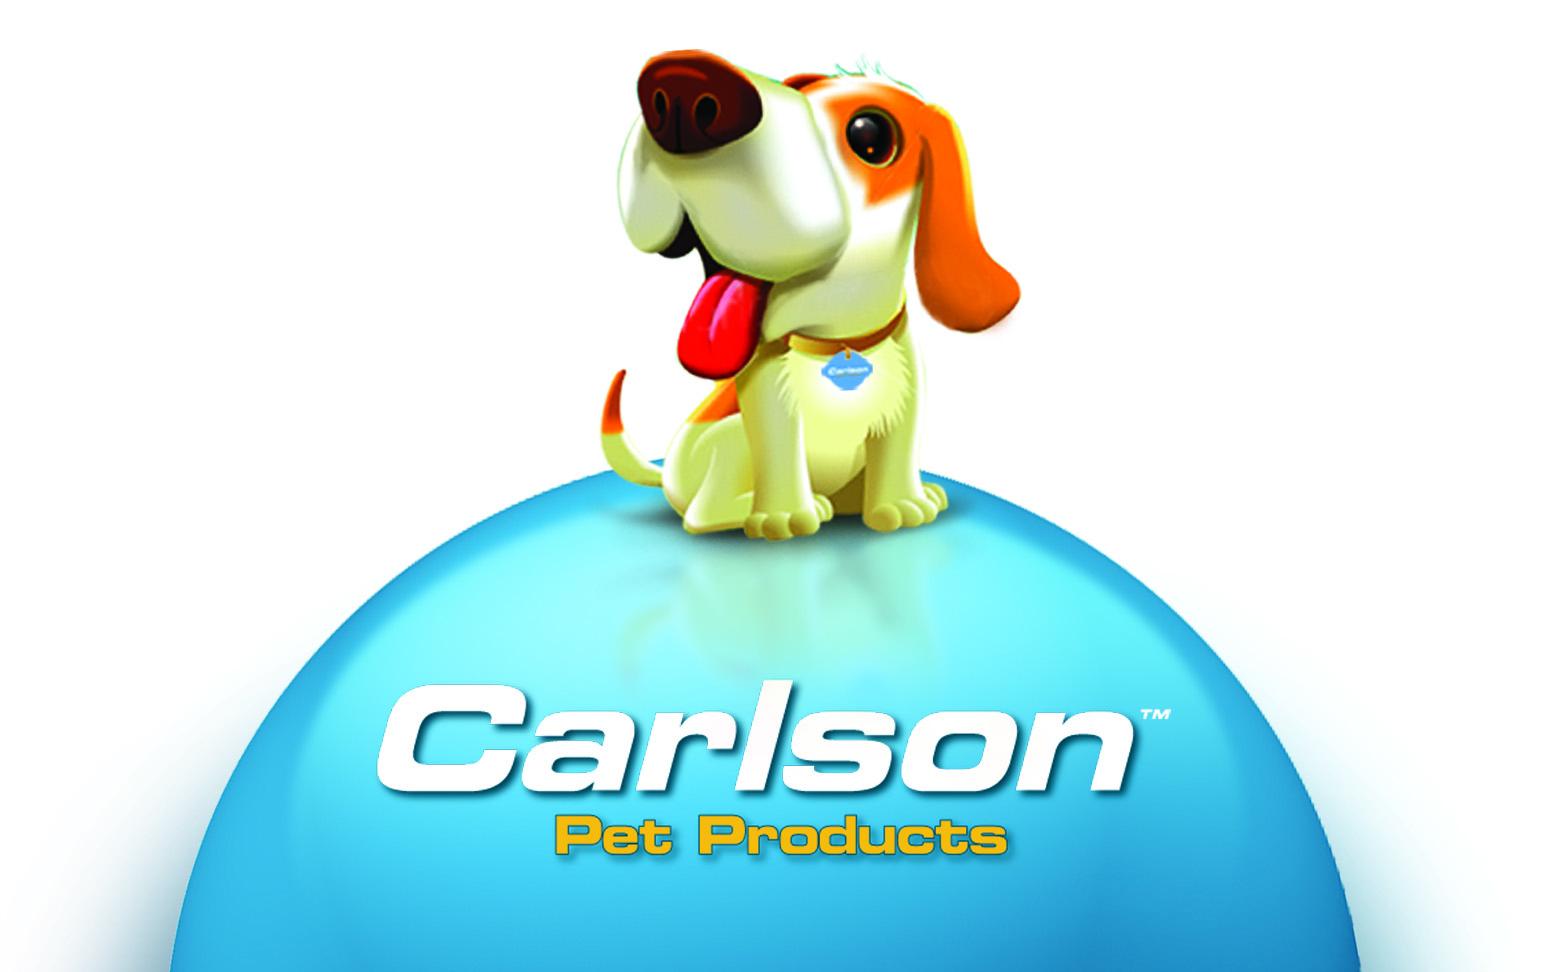 Carlson-logo kopiera